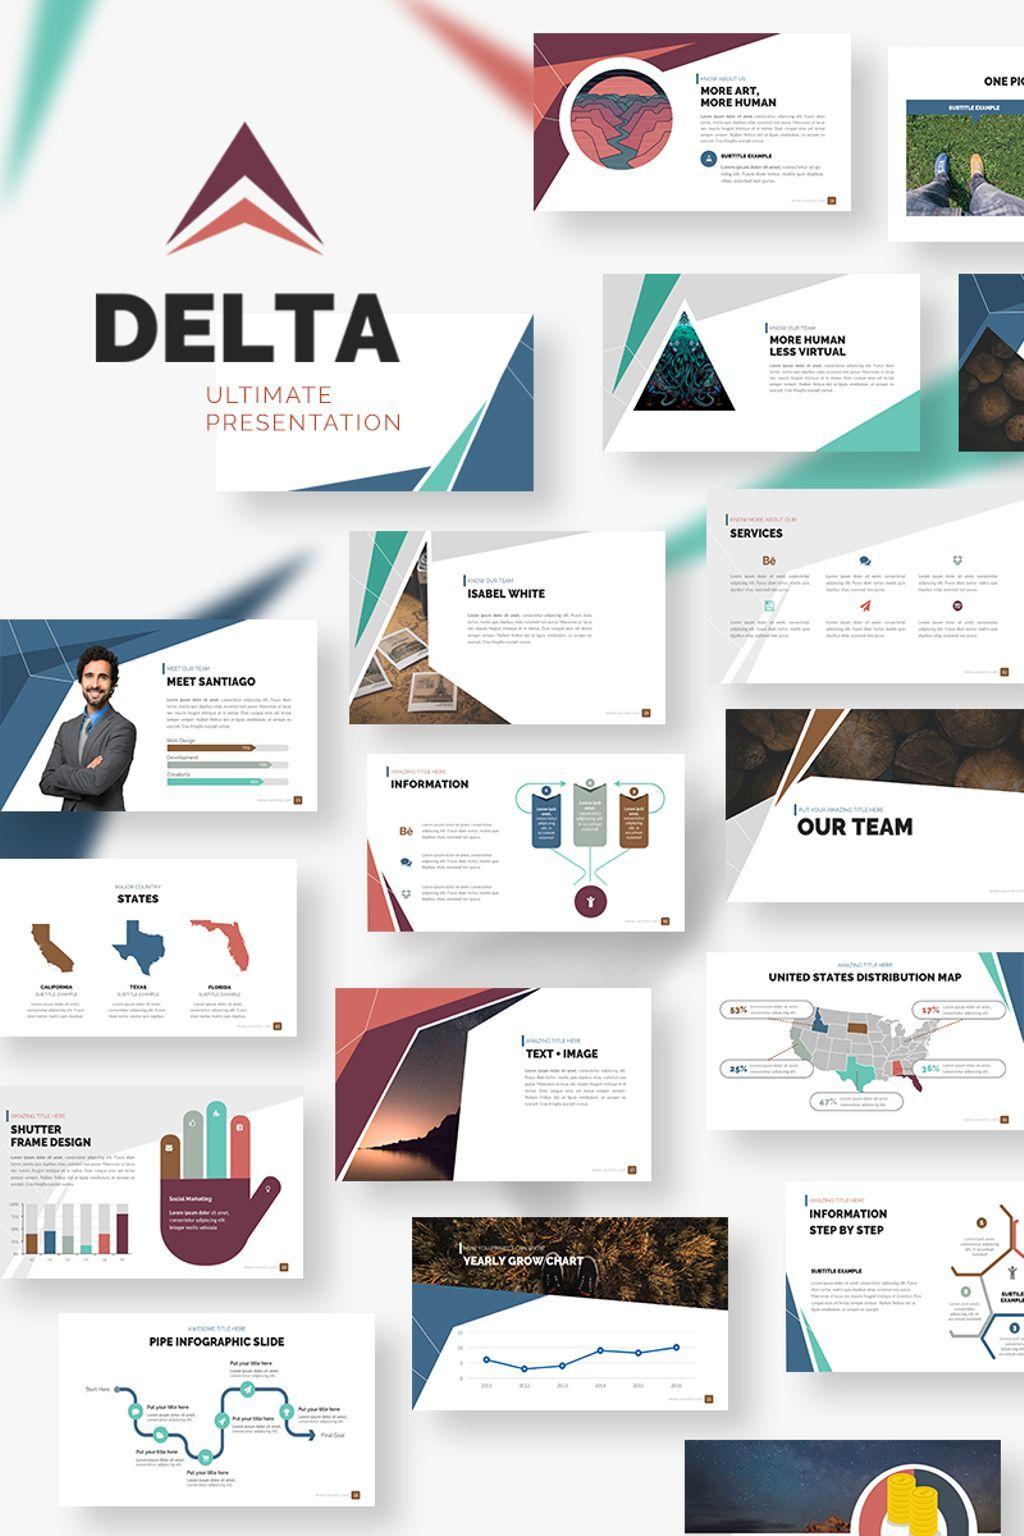 delta presentation powerpoint template backgrounds pinterest